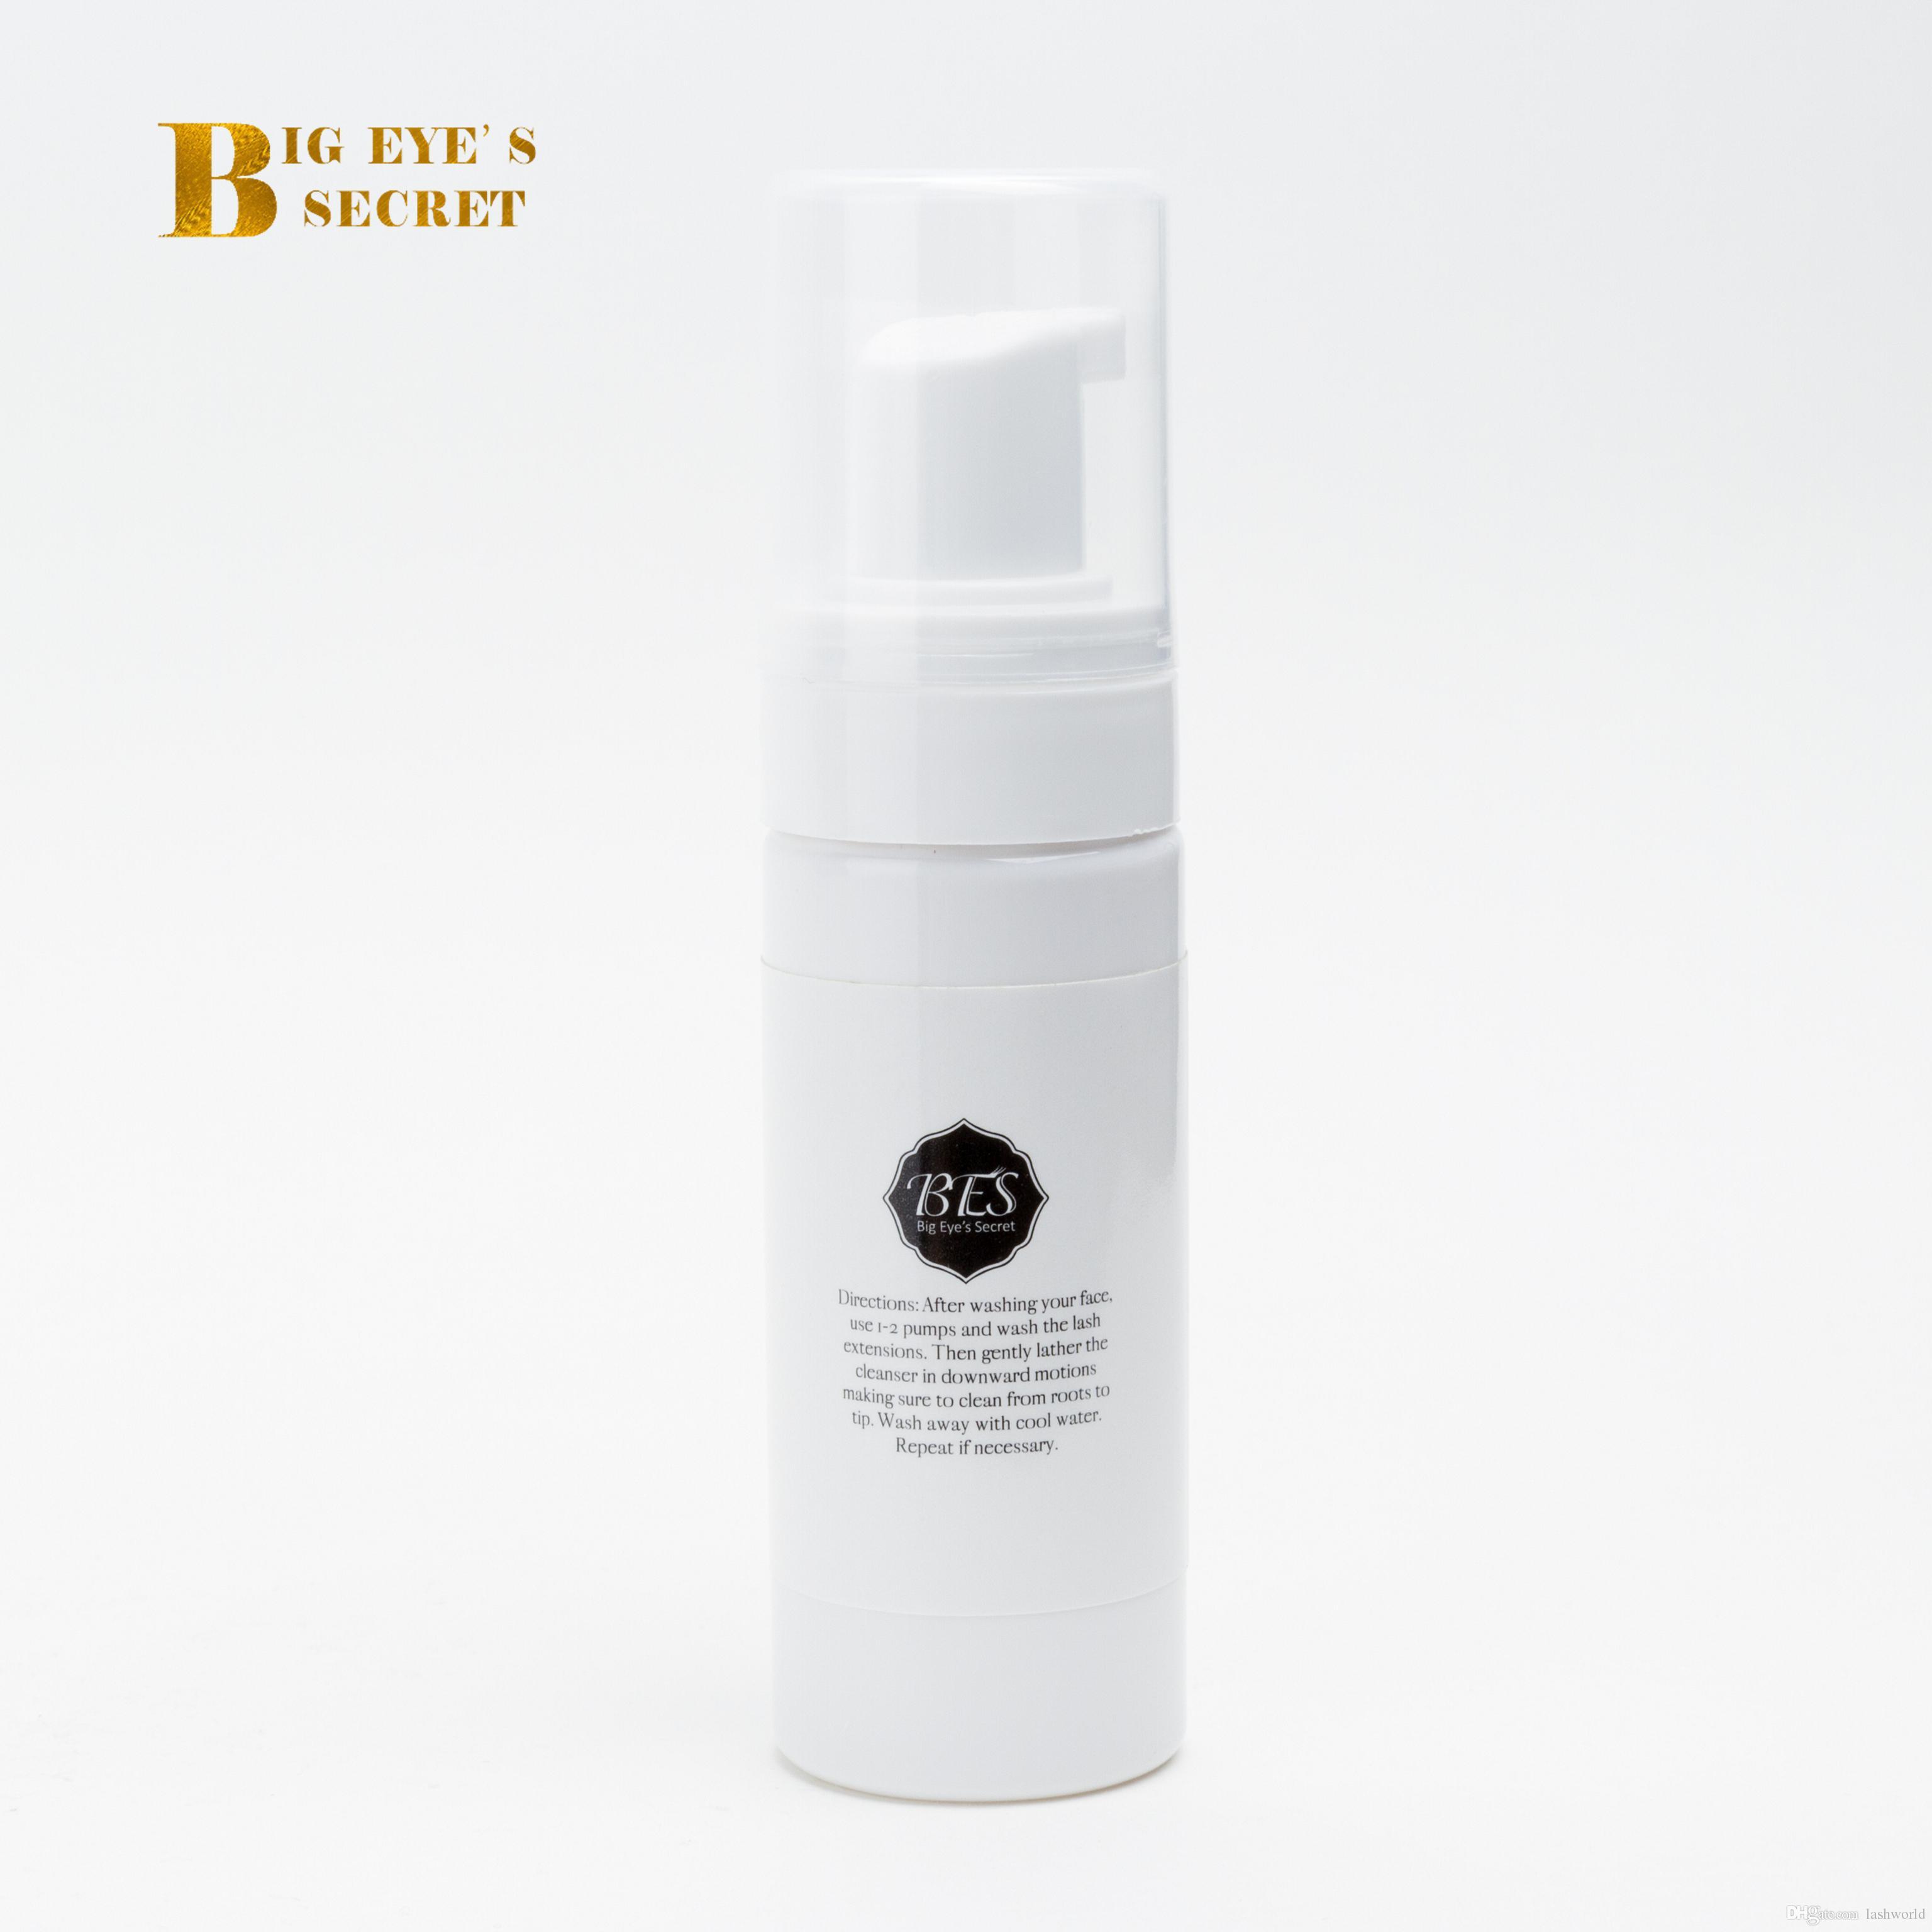 Big Eye Secret رمش المطهر 50ML ساكورا رائحة أدوات ماكياج رمش تمديد السائل نظيفة للرموش شحن مجاني